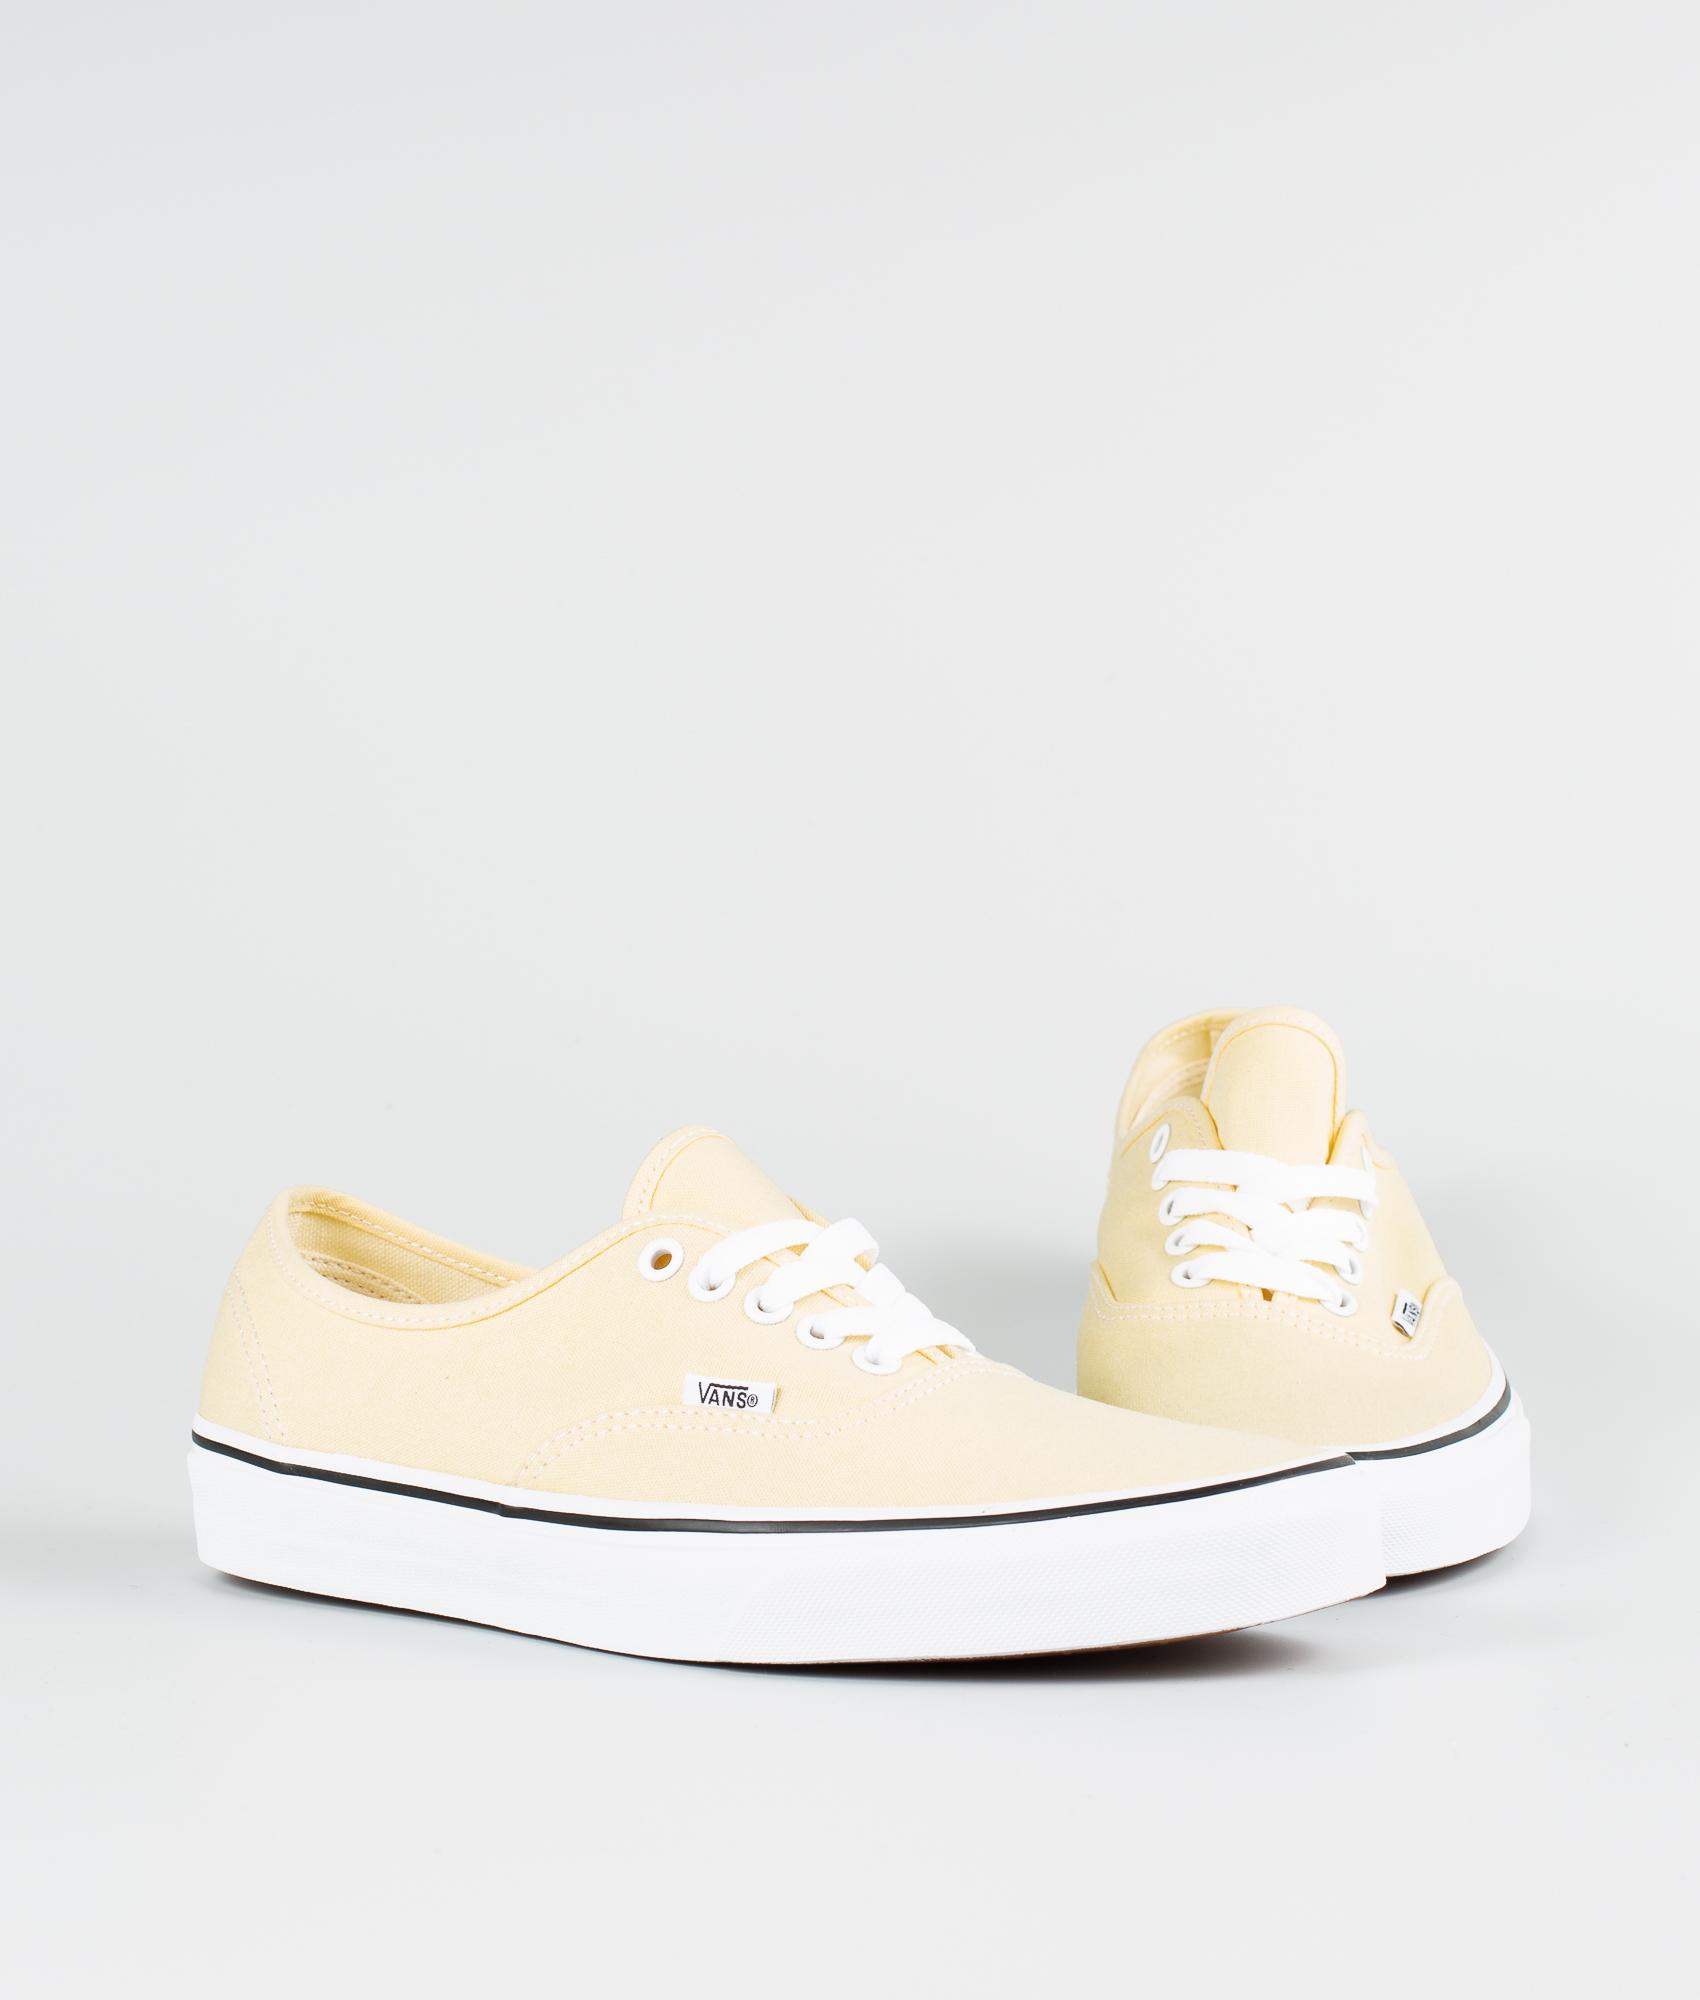 Vans Authentic Schuhe Vanilla CustardTrue White